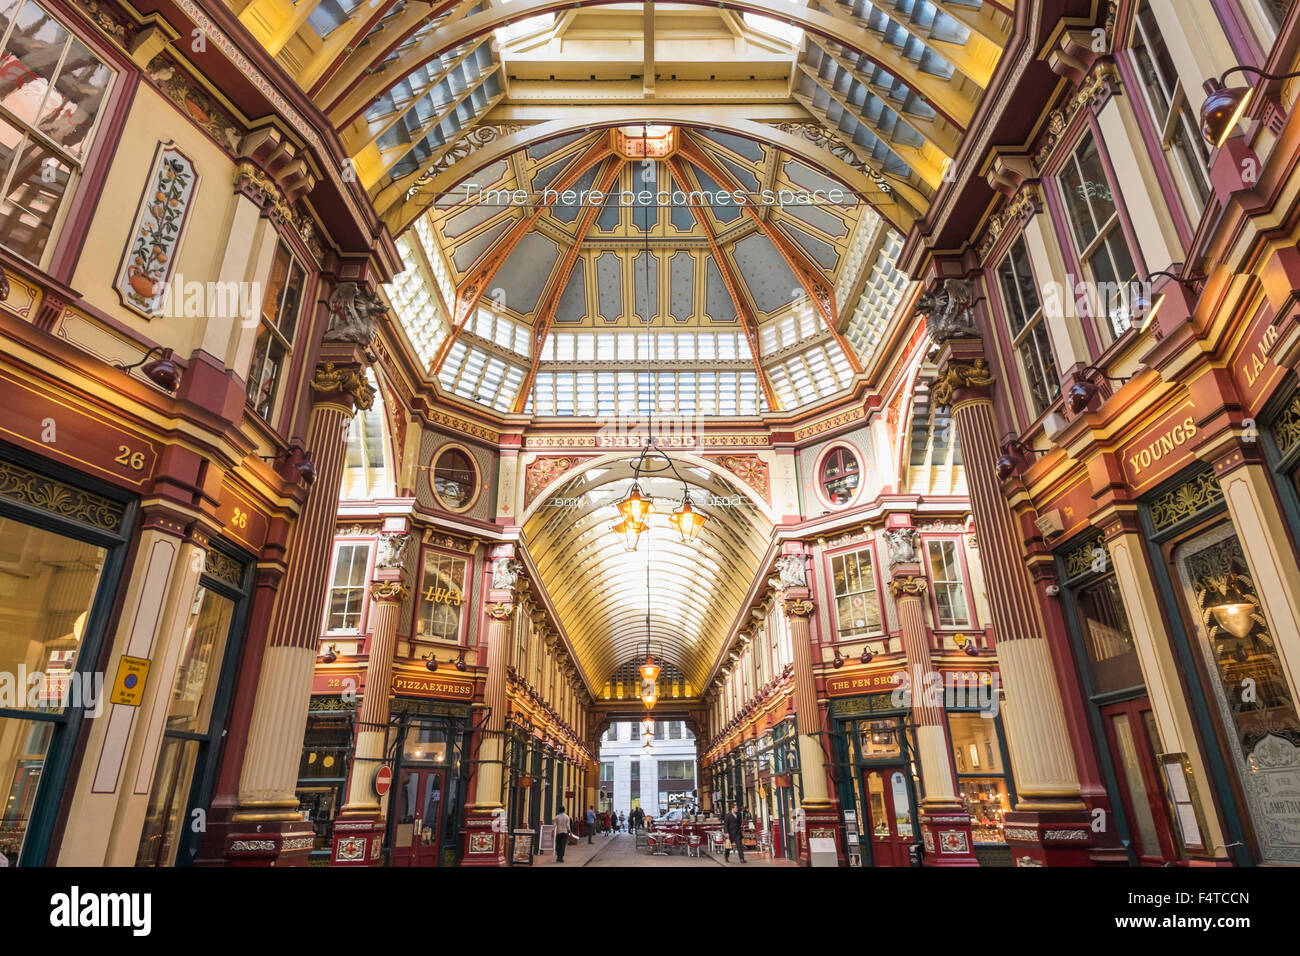 England, London, City, Leadenhall Market - Stock Image